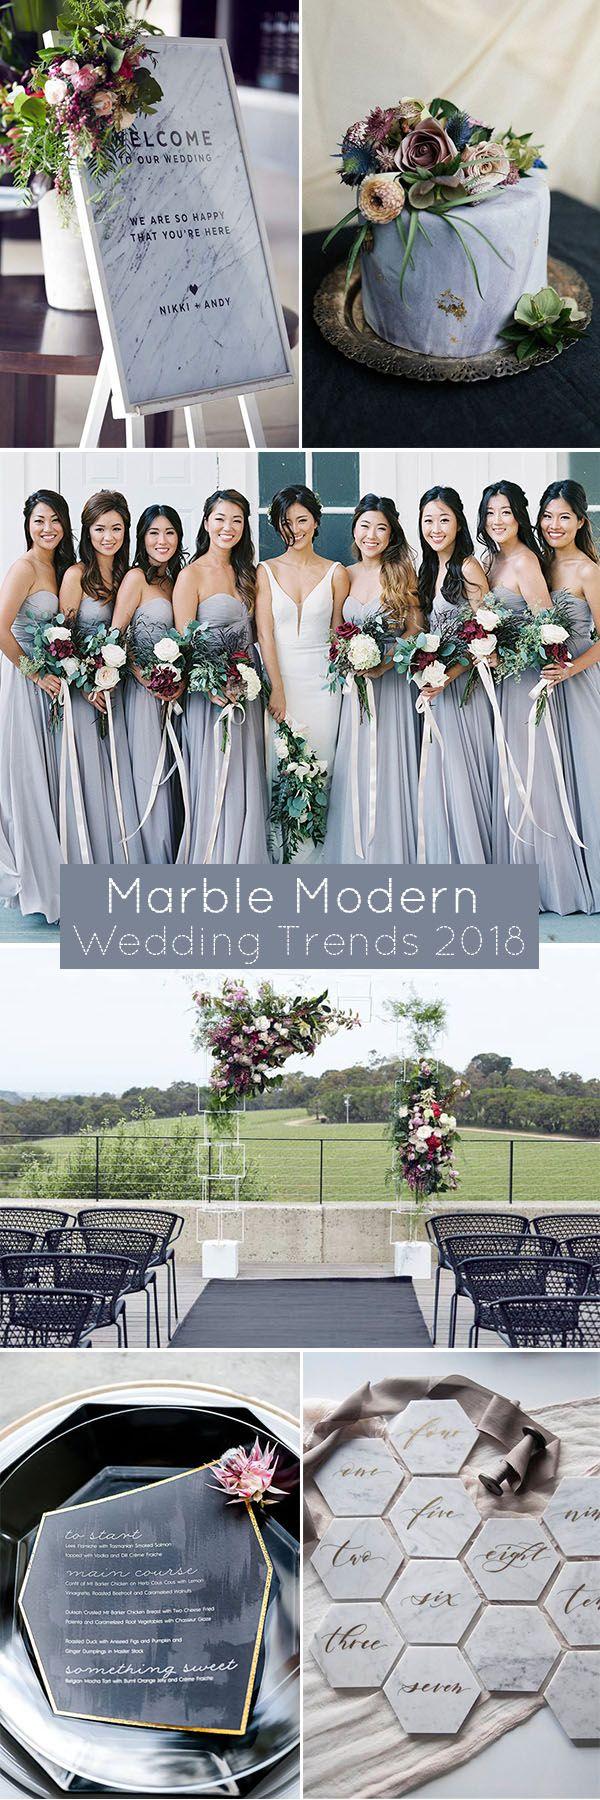 Wedding reception wedding decorations 2018   Big Modern Wedding Decoration Trends for Brides to Follow in